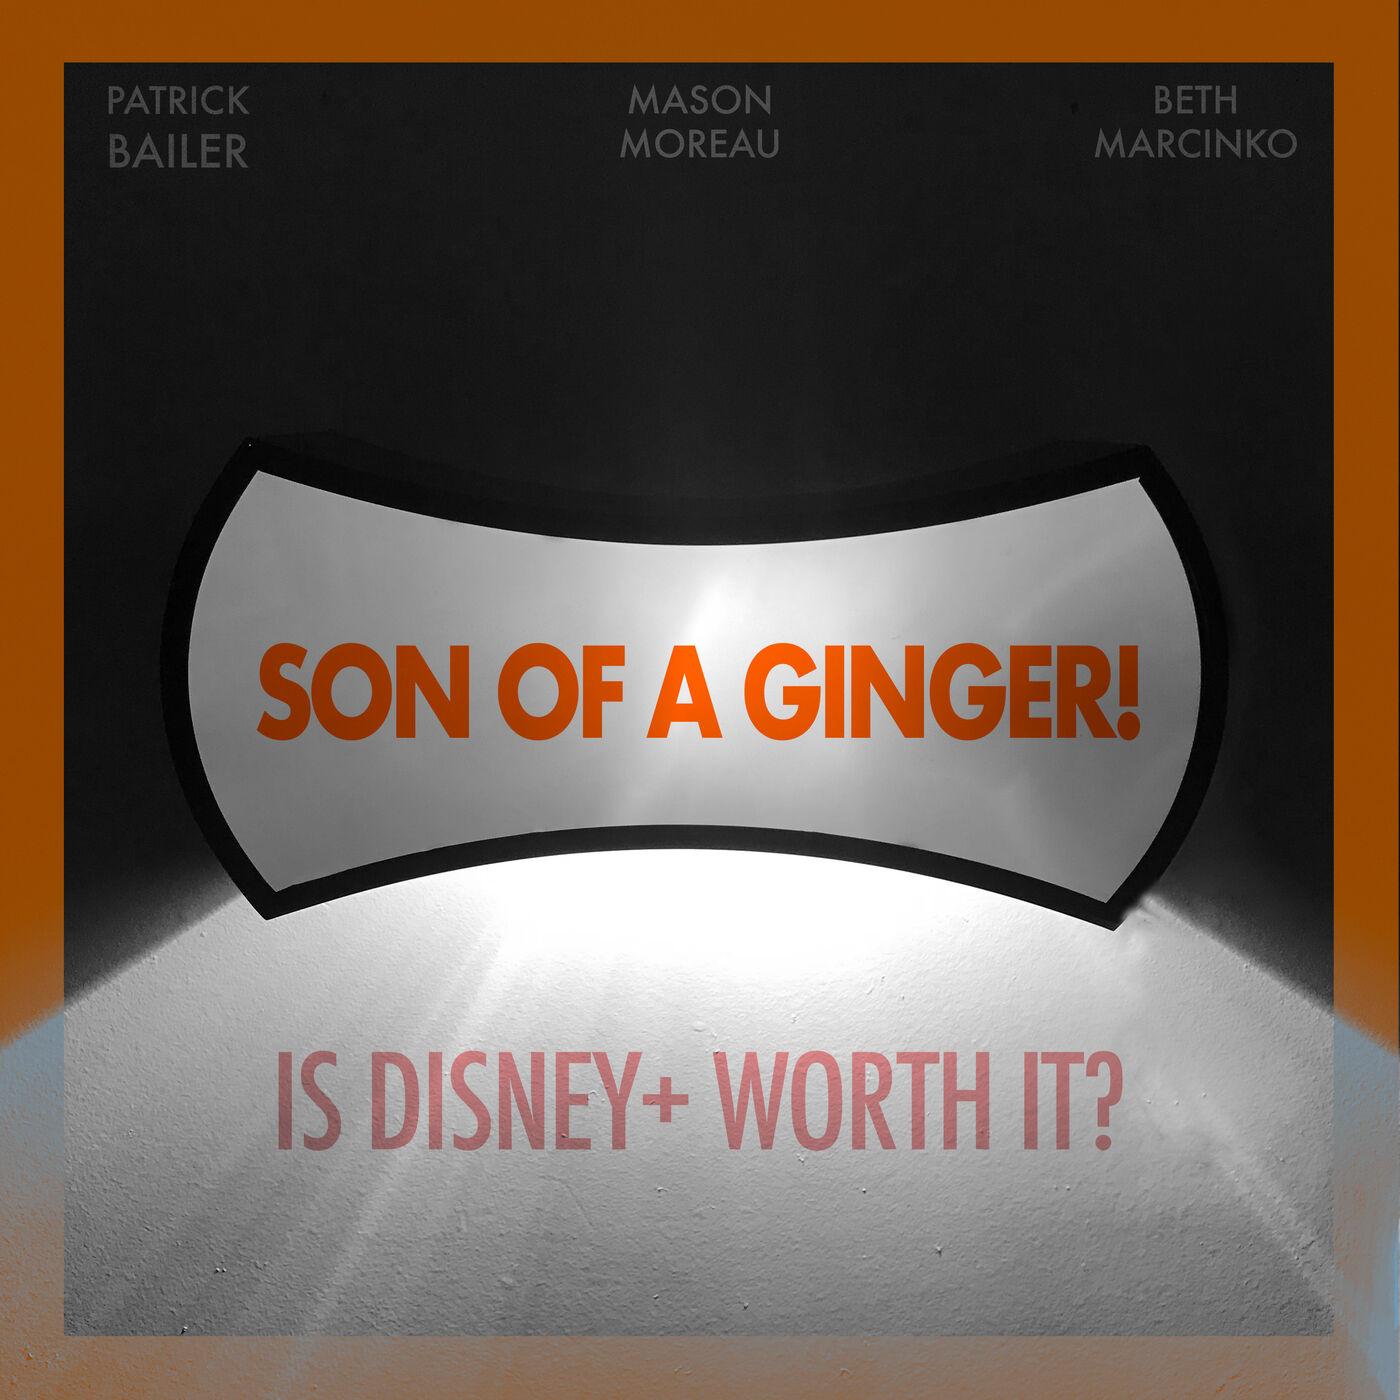 Streaming Showdown Episode 1: Is Disney+ worth it?